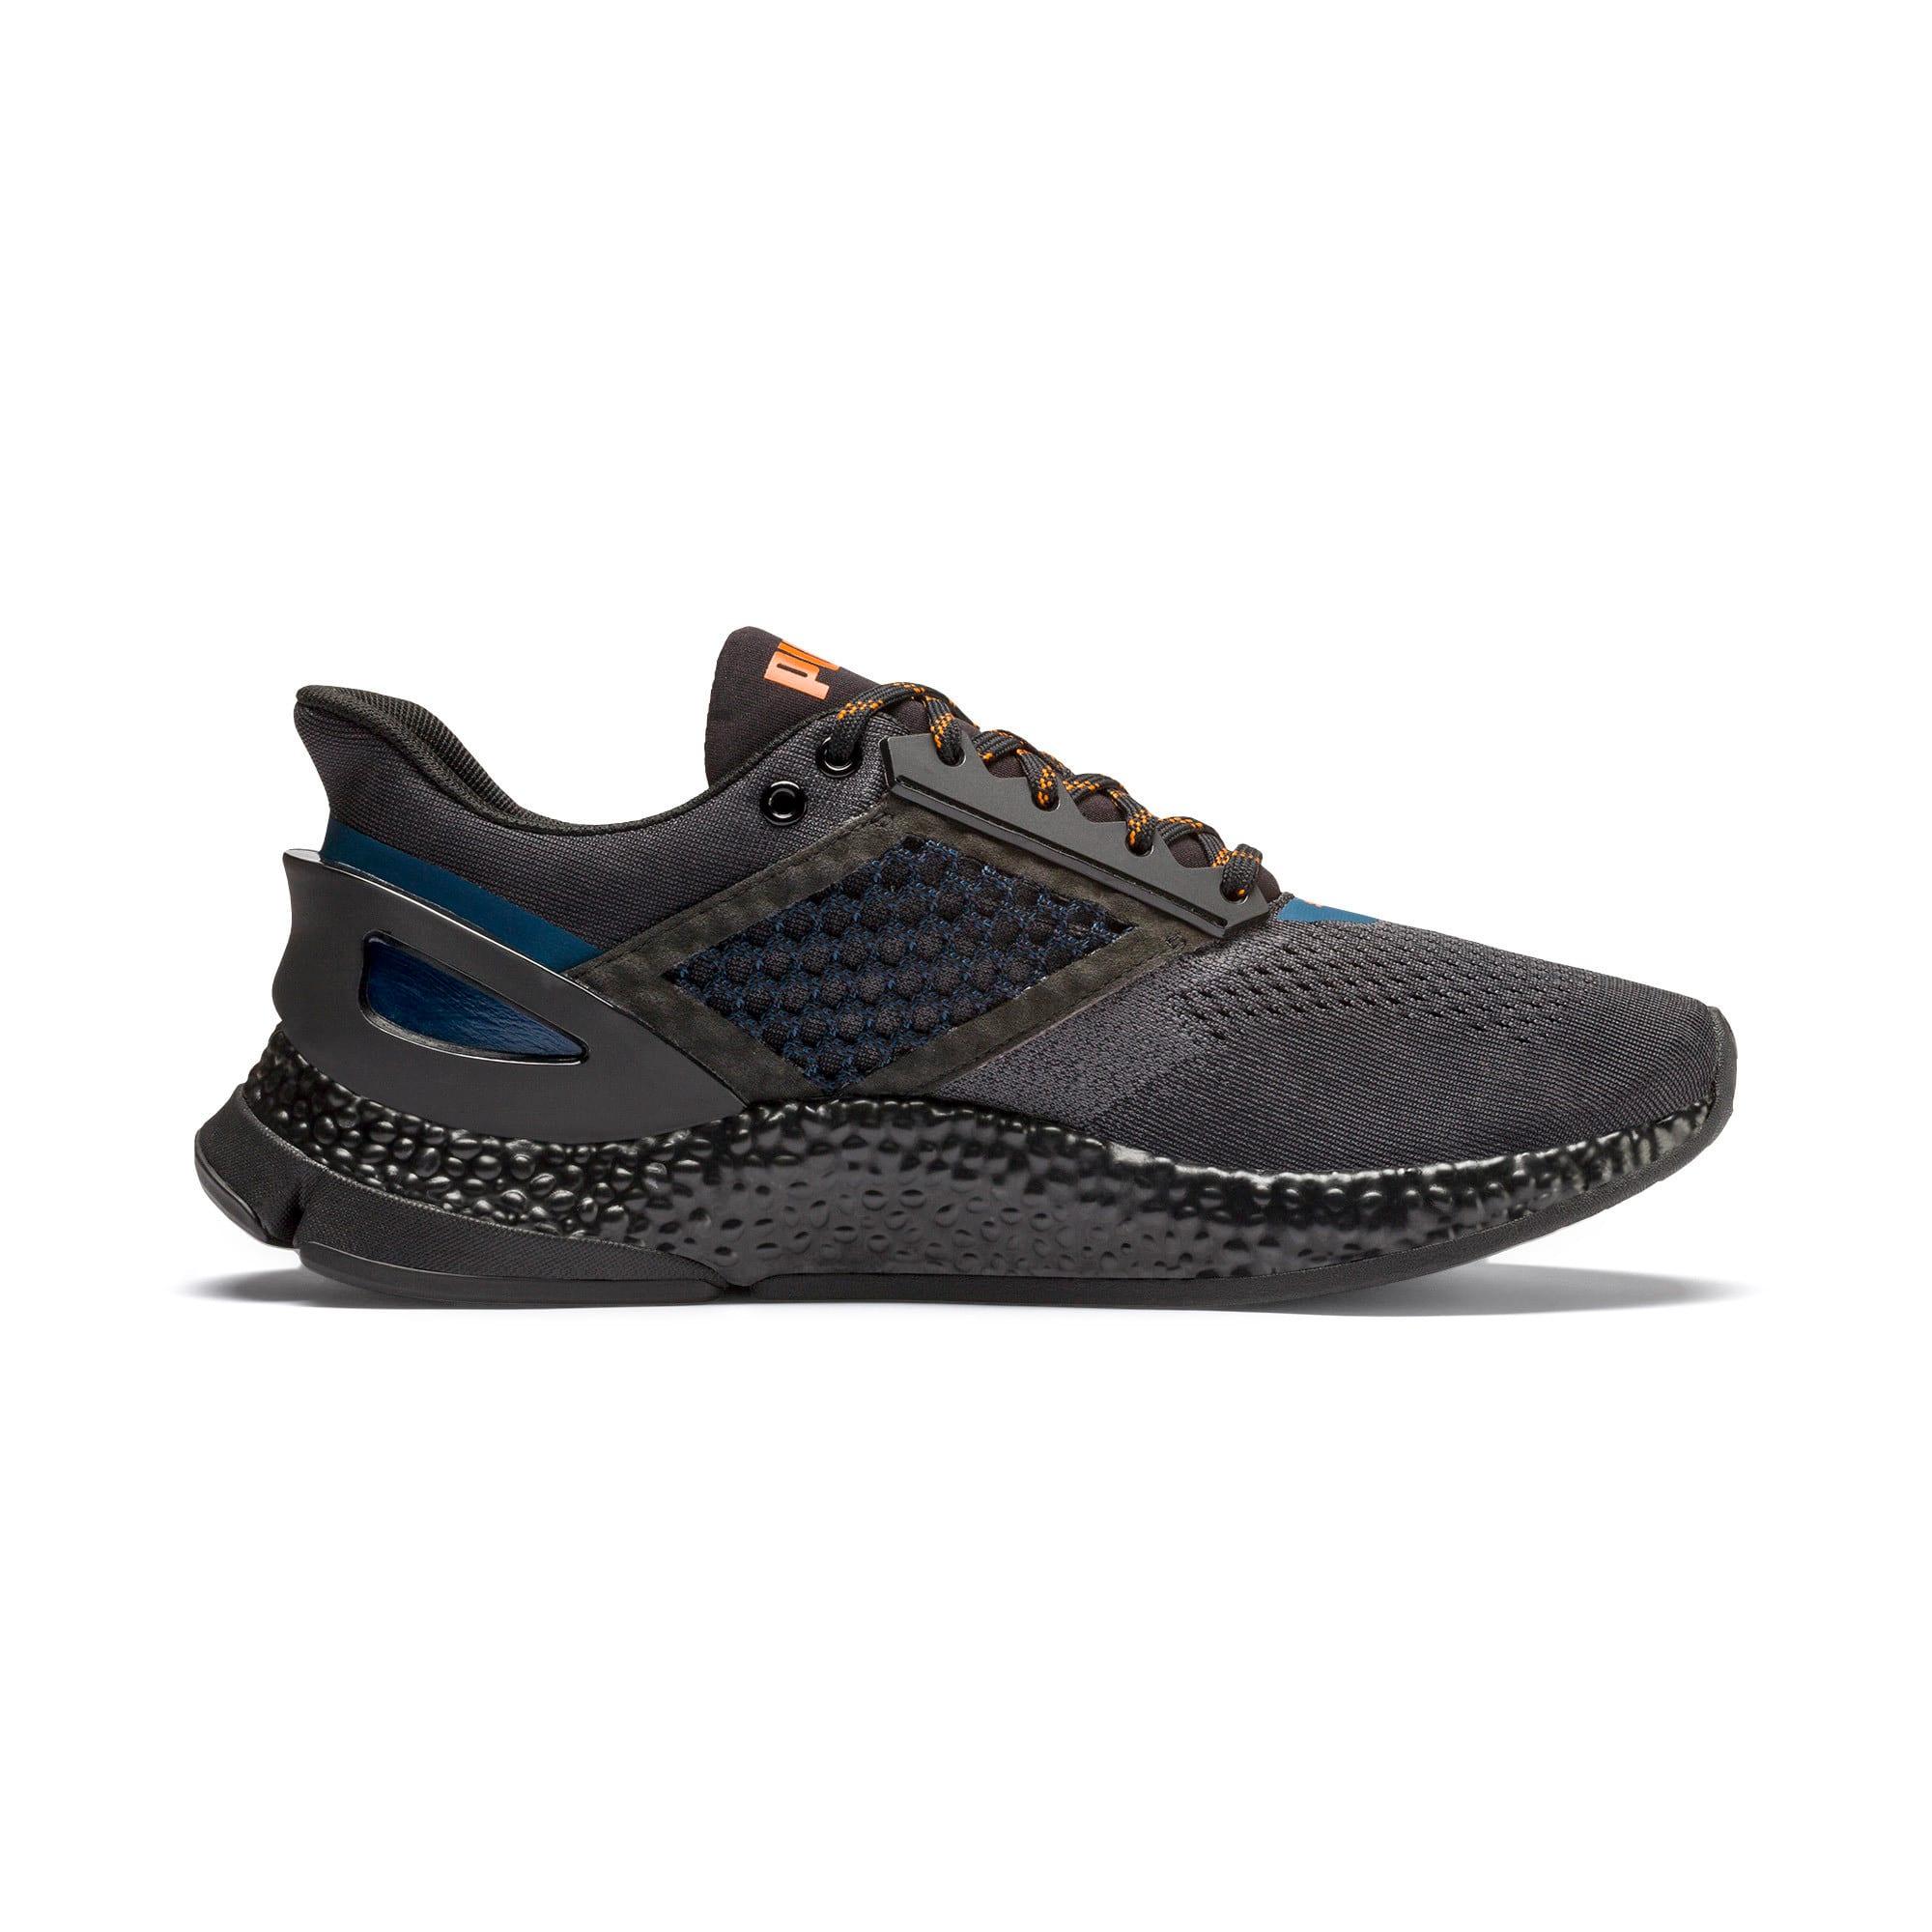 Imagen en miniatura 7 de Zapatillas de running de hombre HYBRID NETFIT Astro, Gibraltar Sea-Puma Black, mediana